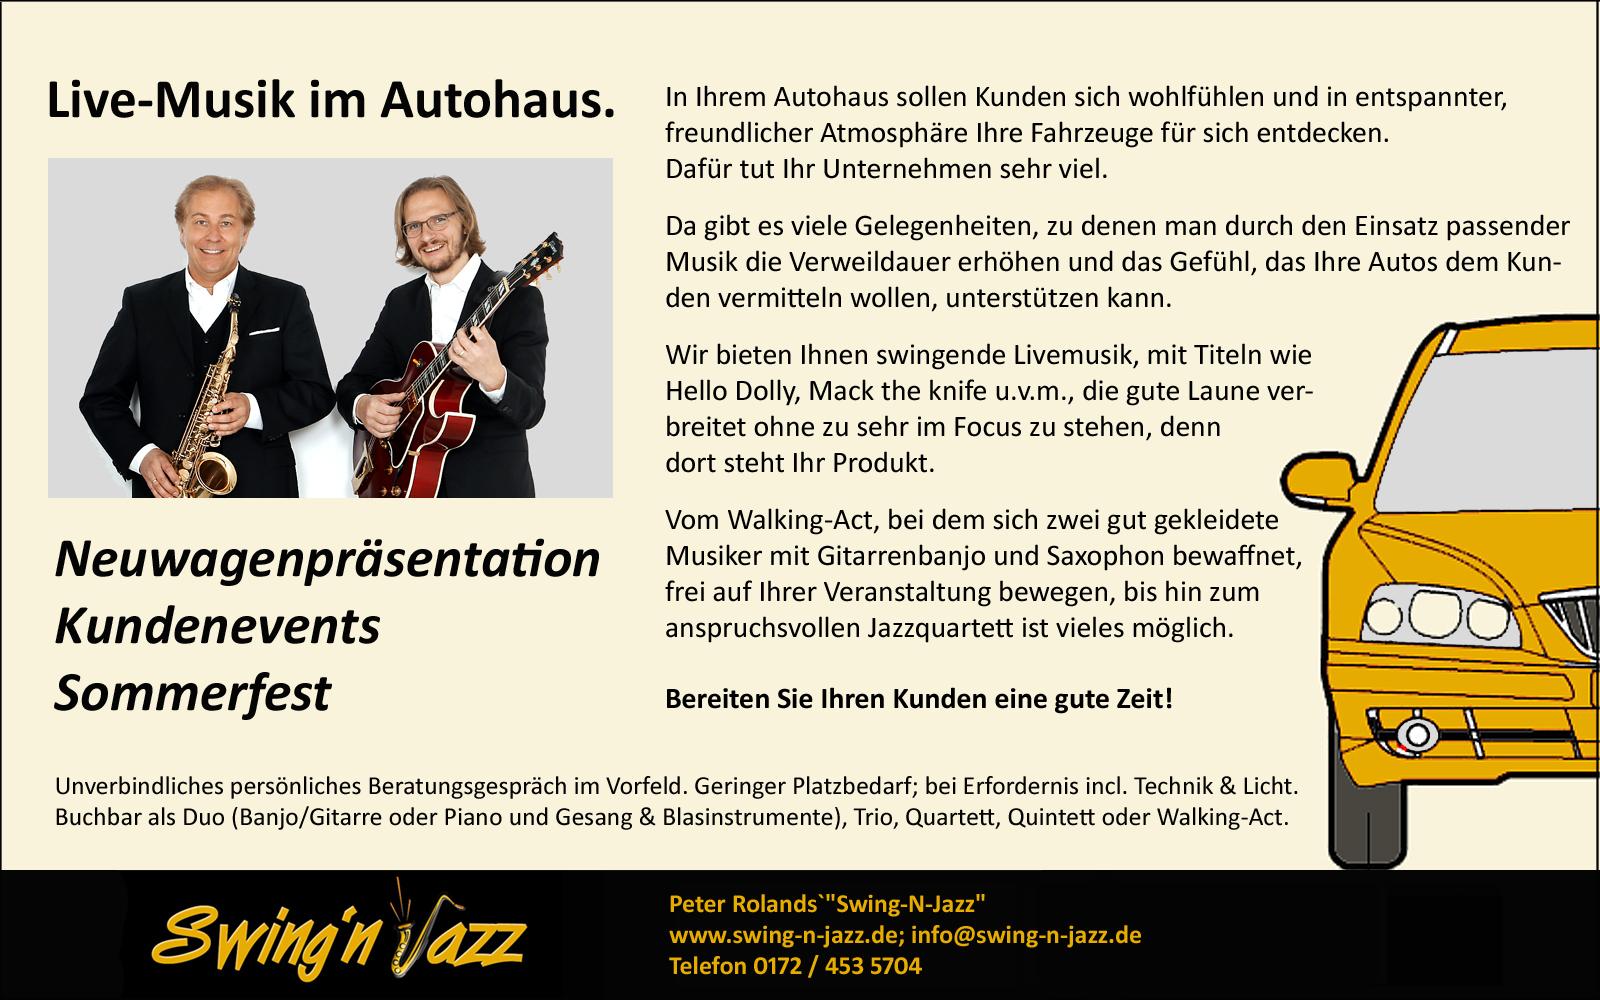 Live-Musik im Autohaus. Peter Roland`s Swing-N-Jazz.de